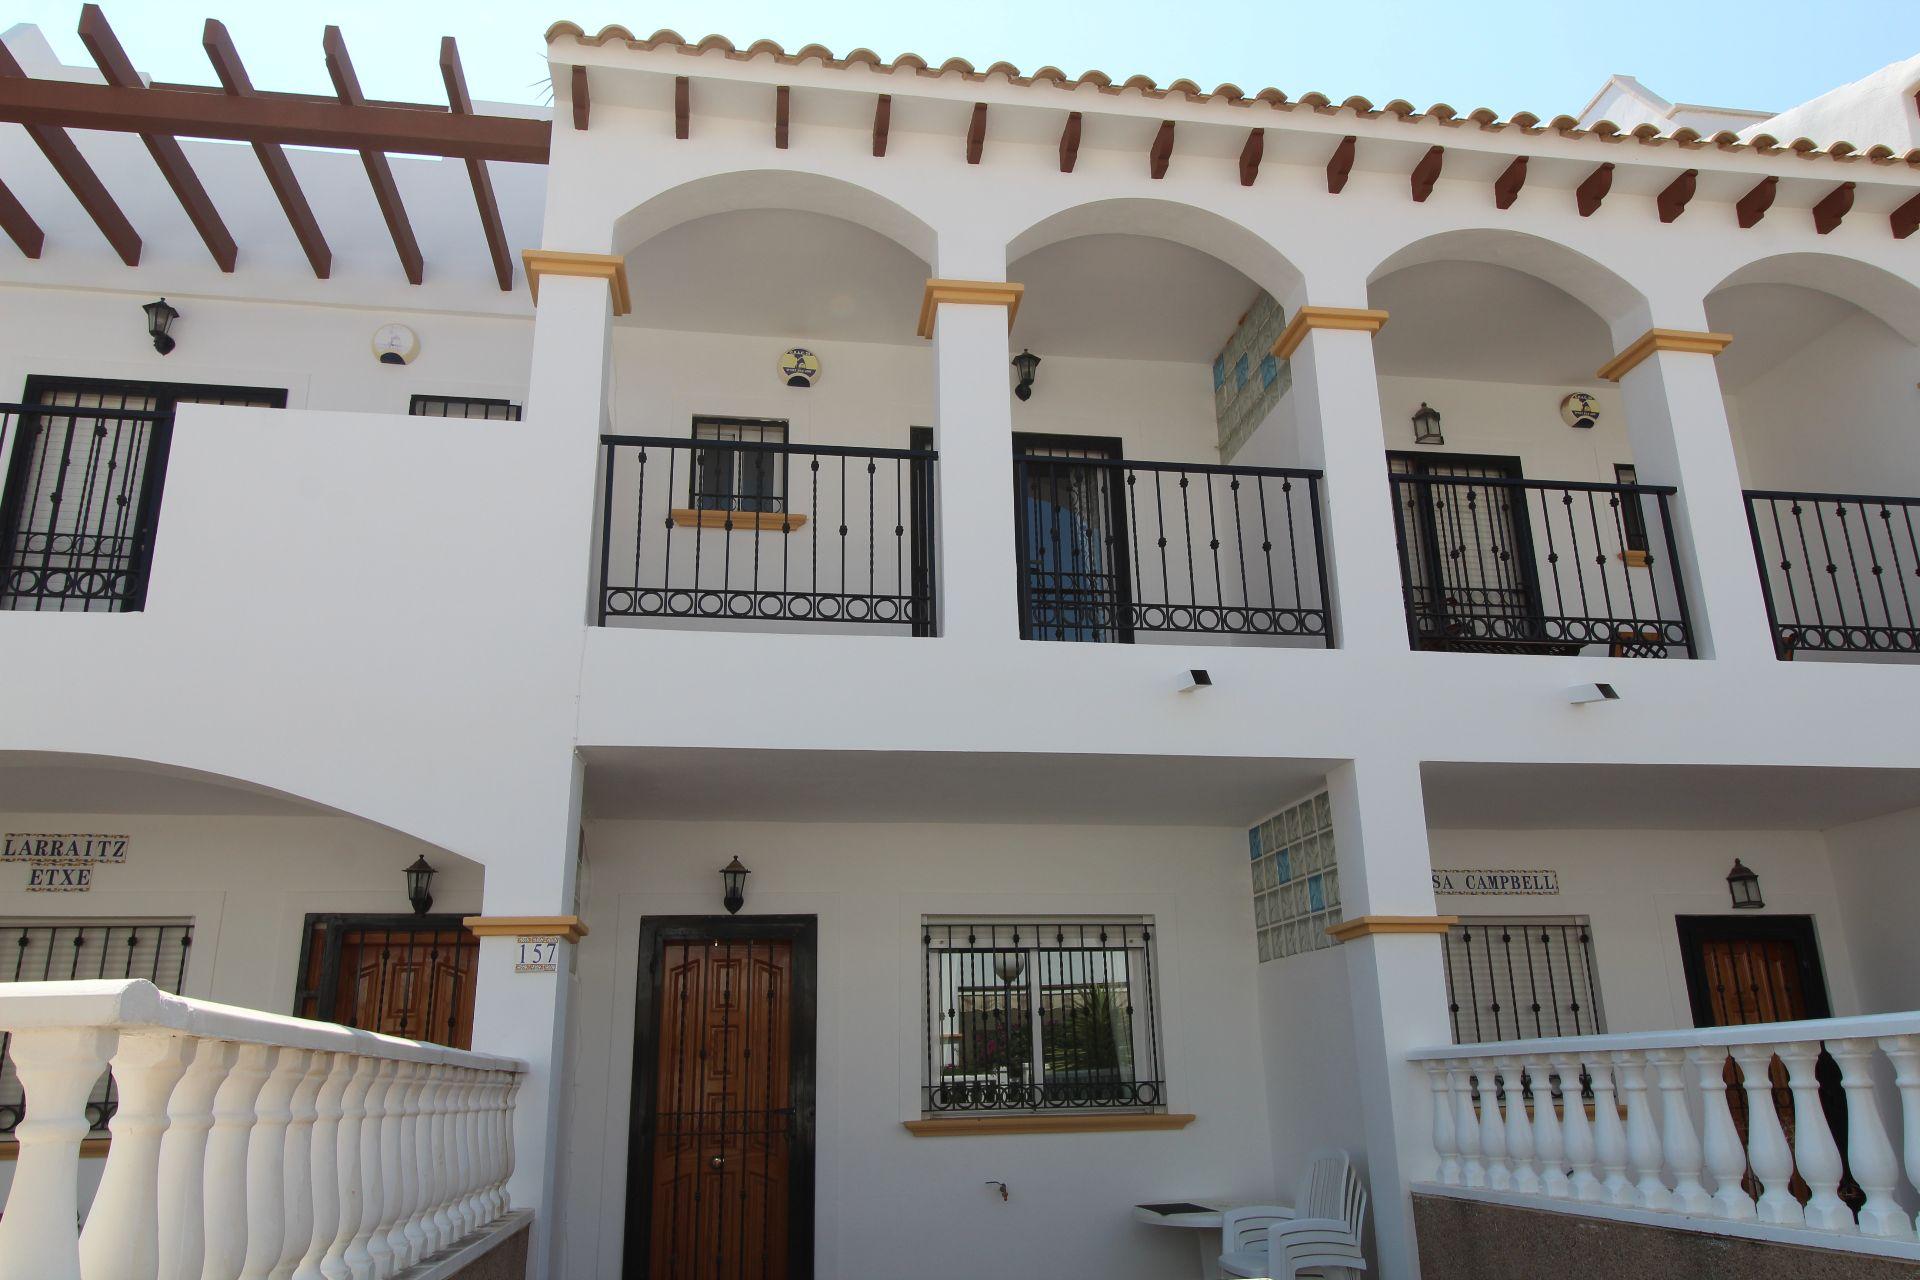 LONG TERM RENTAL - 2 Bed 2 Bath Townhouse in Punta Prima 500€ per Month plus Bills CPR2044